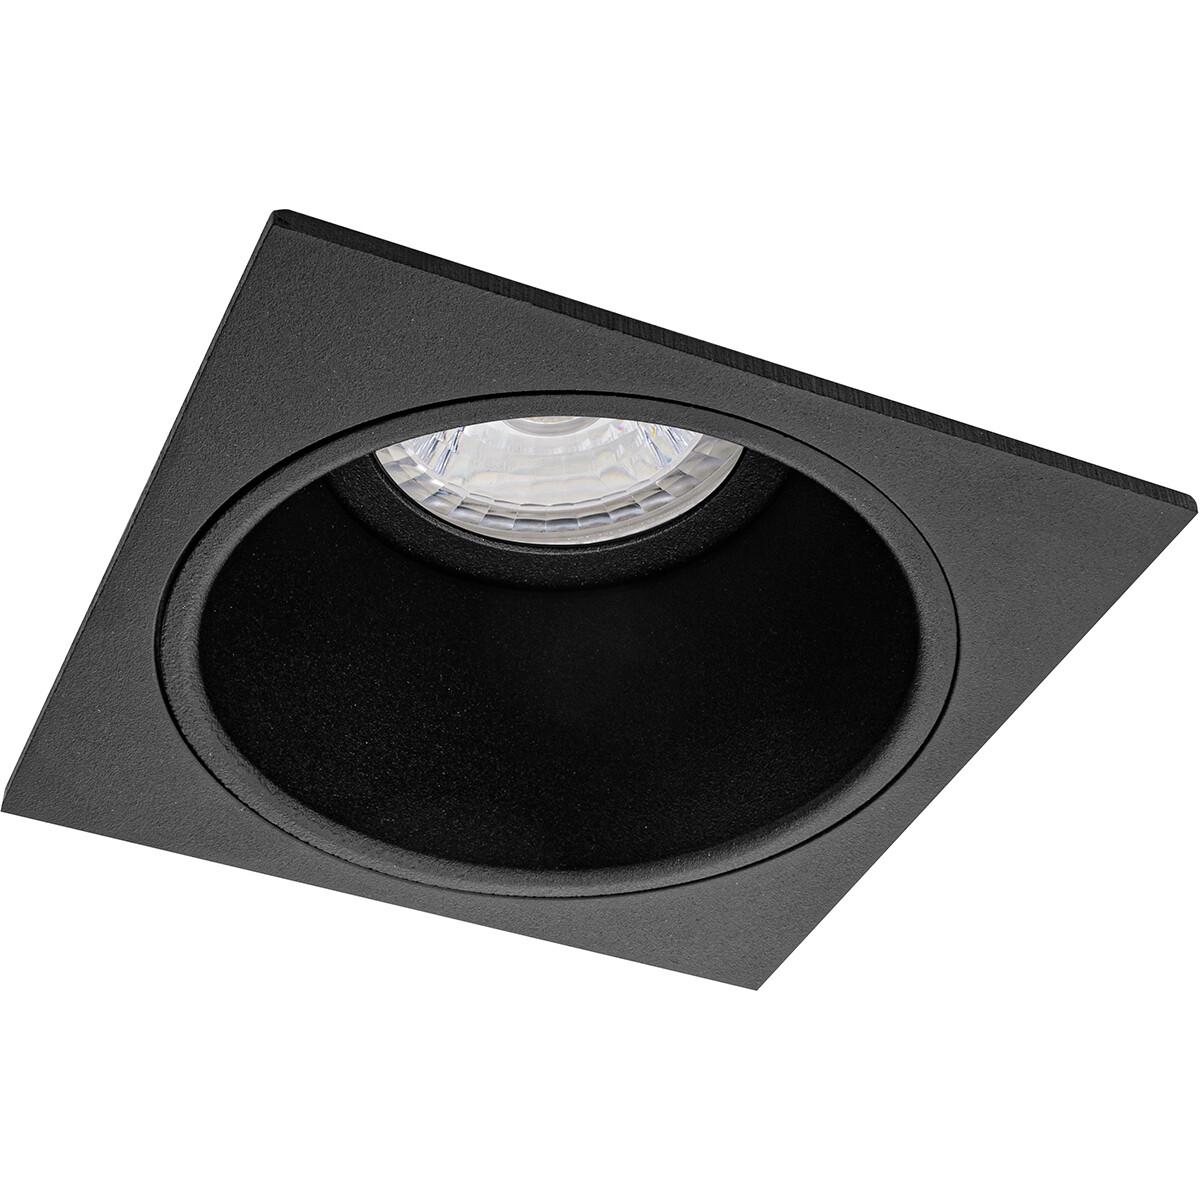 Spot Armatuur GU10 - Pragmi Minko Pro - Inbouw Vierkant - Mat Zwart - Aluminium - Verdiept - 90mm